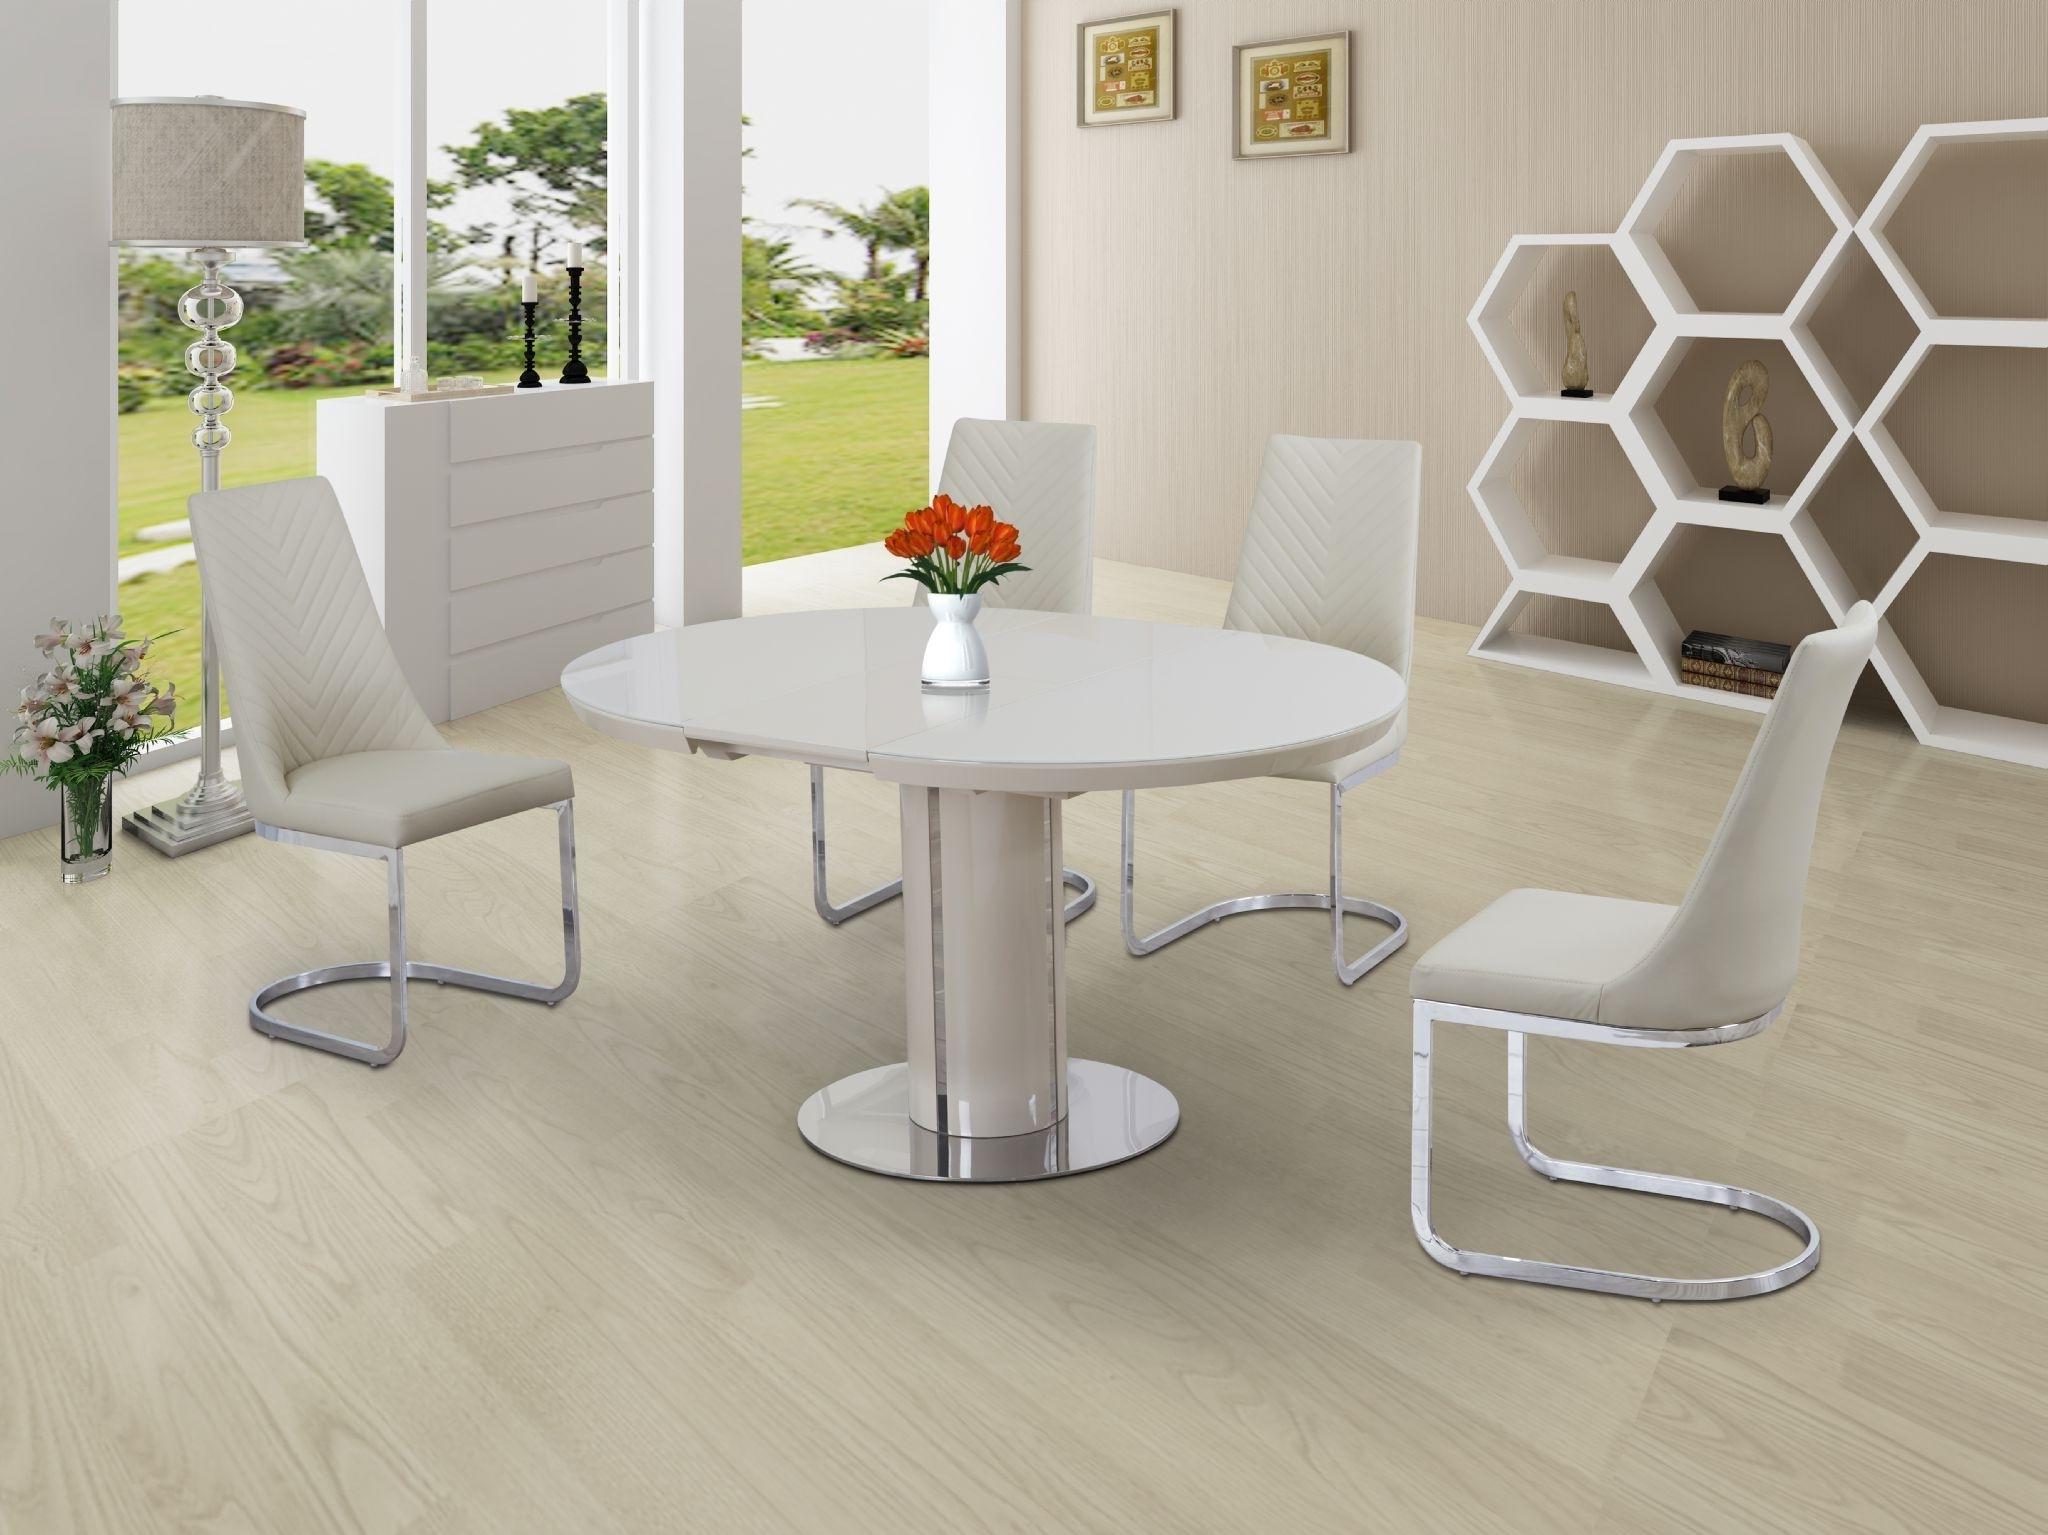 Buy Annular Cream High Gloss Extending Dining Table In Recent White Gloss Extending Dining Tables (View 15 of 25)